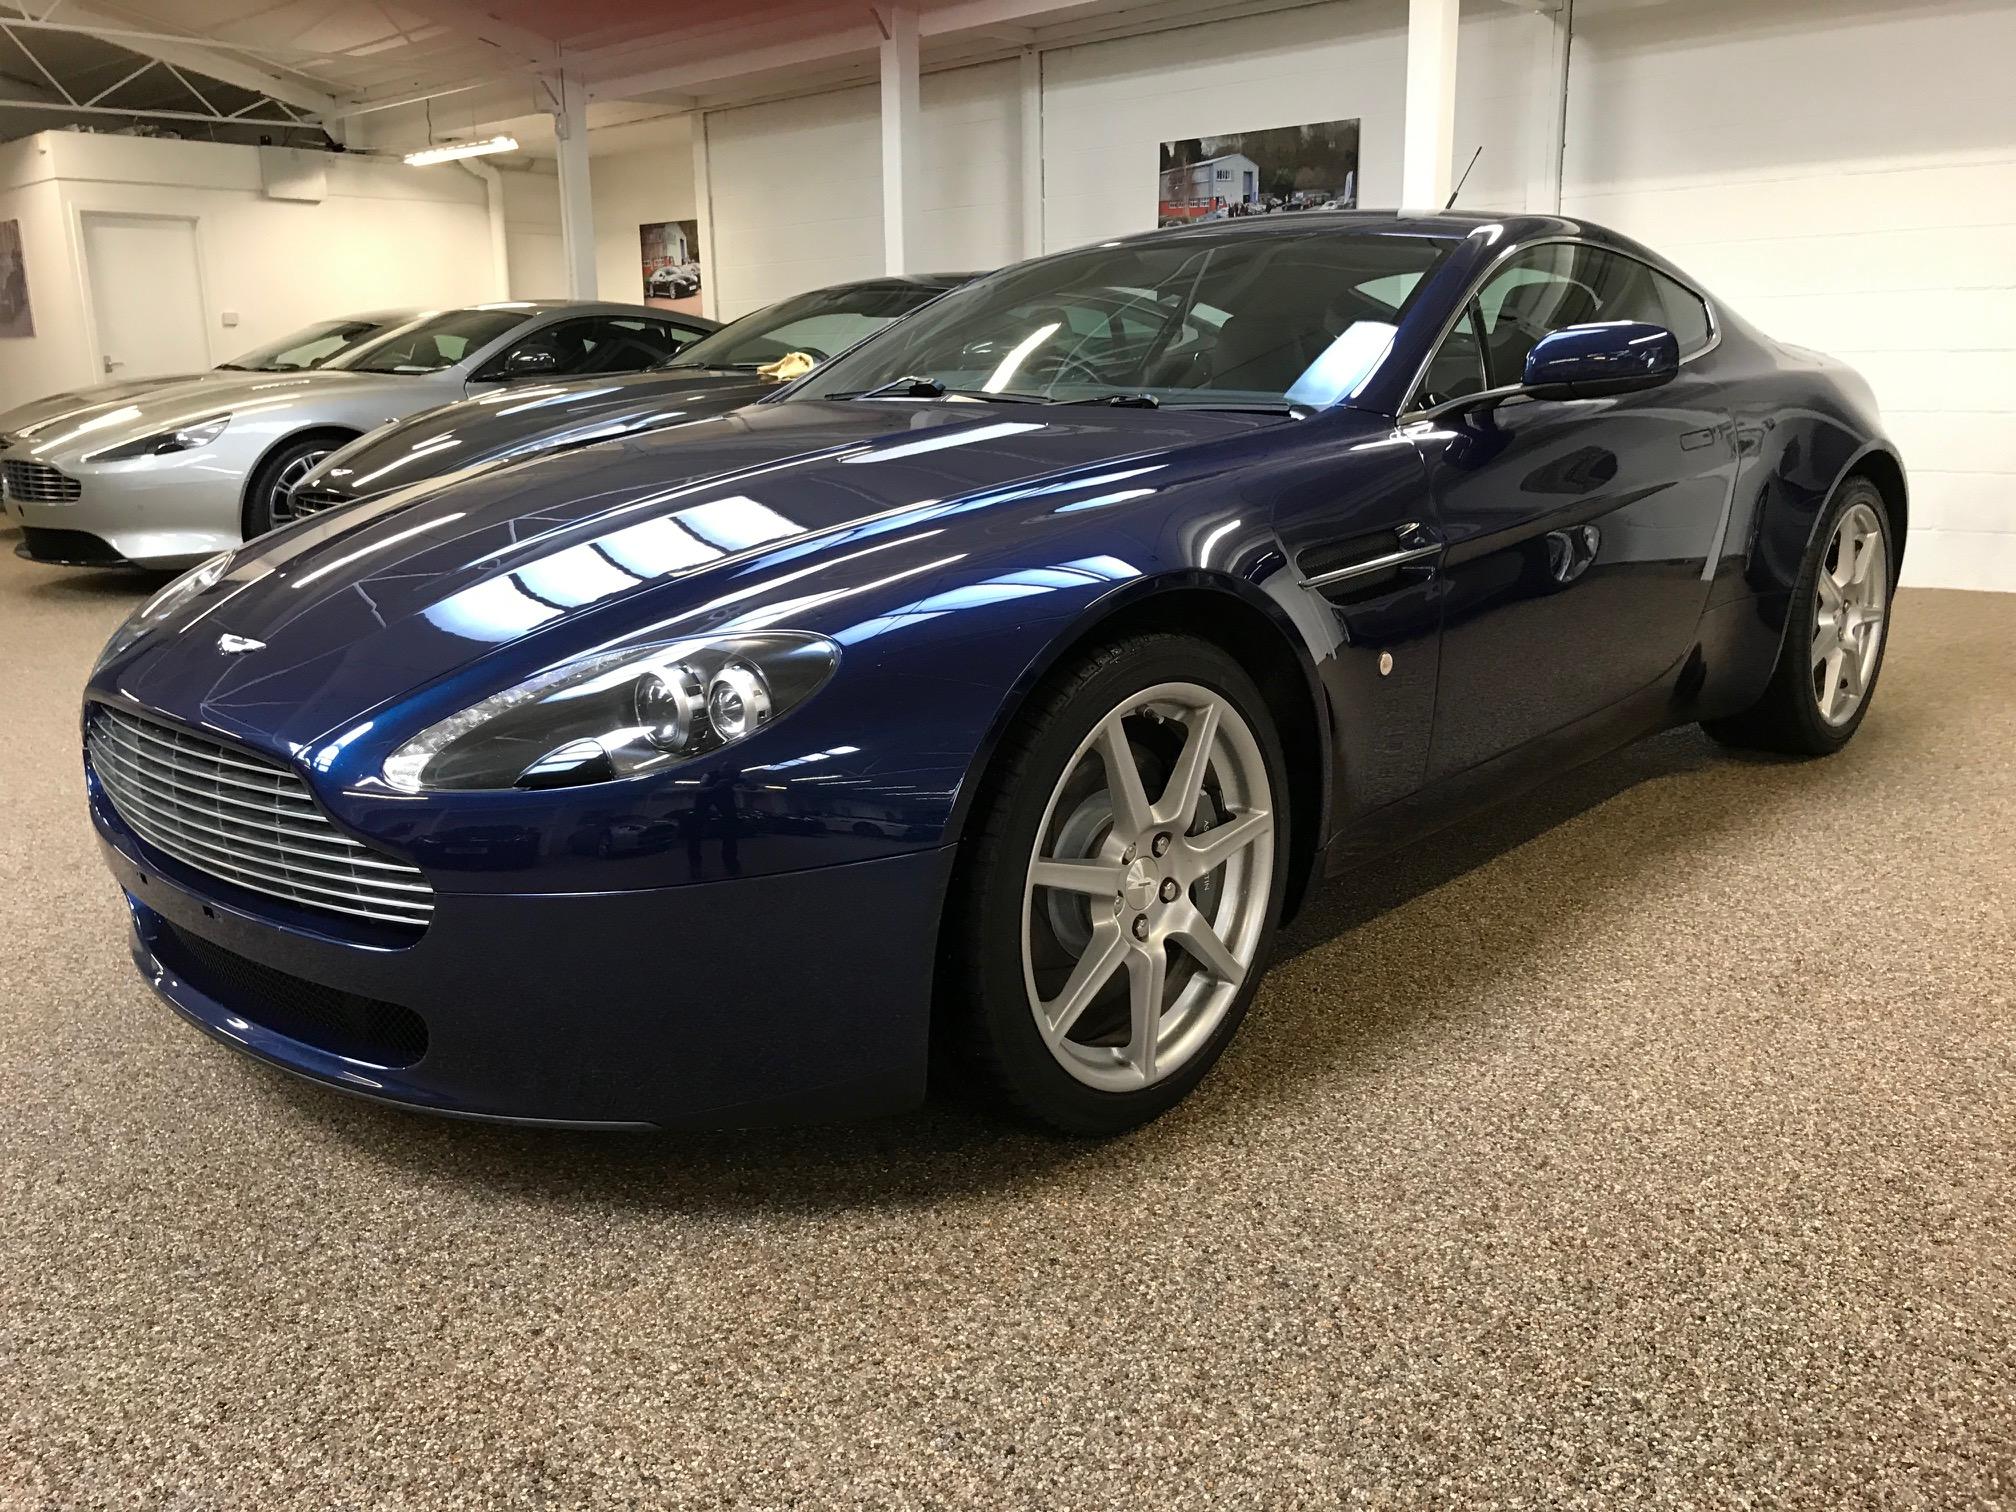 Used Aston Martins For Sale Mcgurk Performance Cars